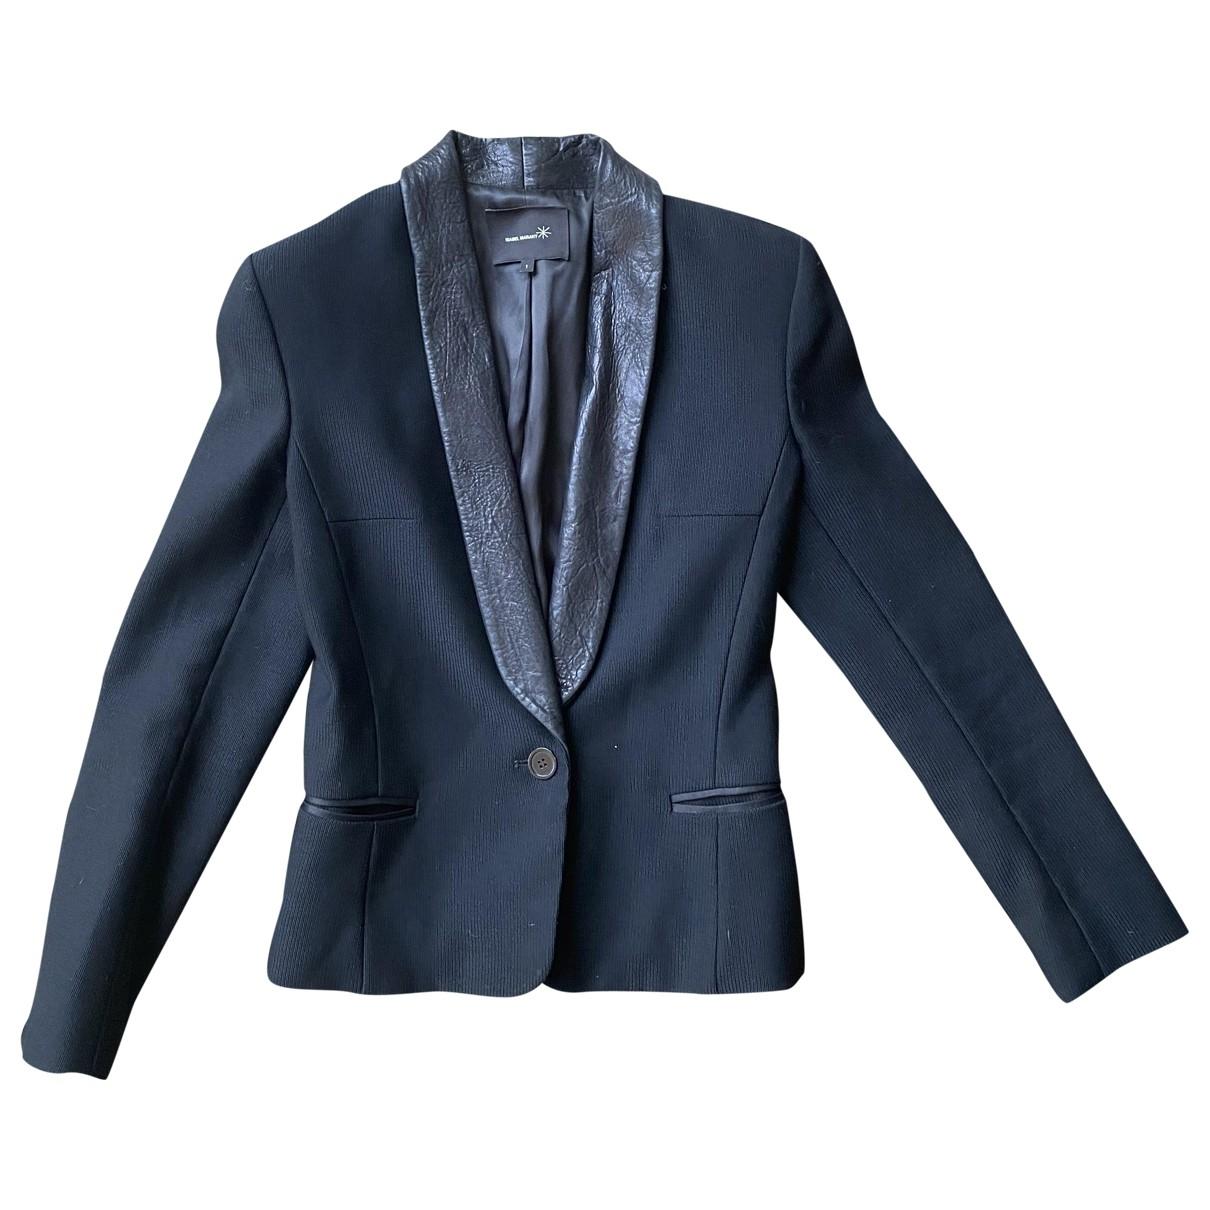 Isabel Marant \N Black Wool jacket for Women 1 0-5